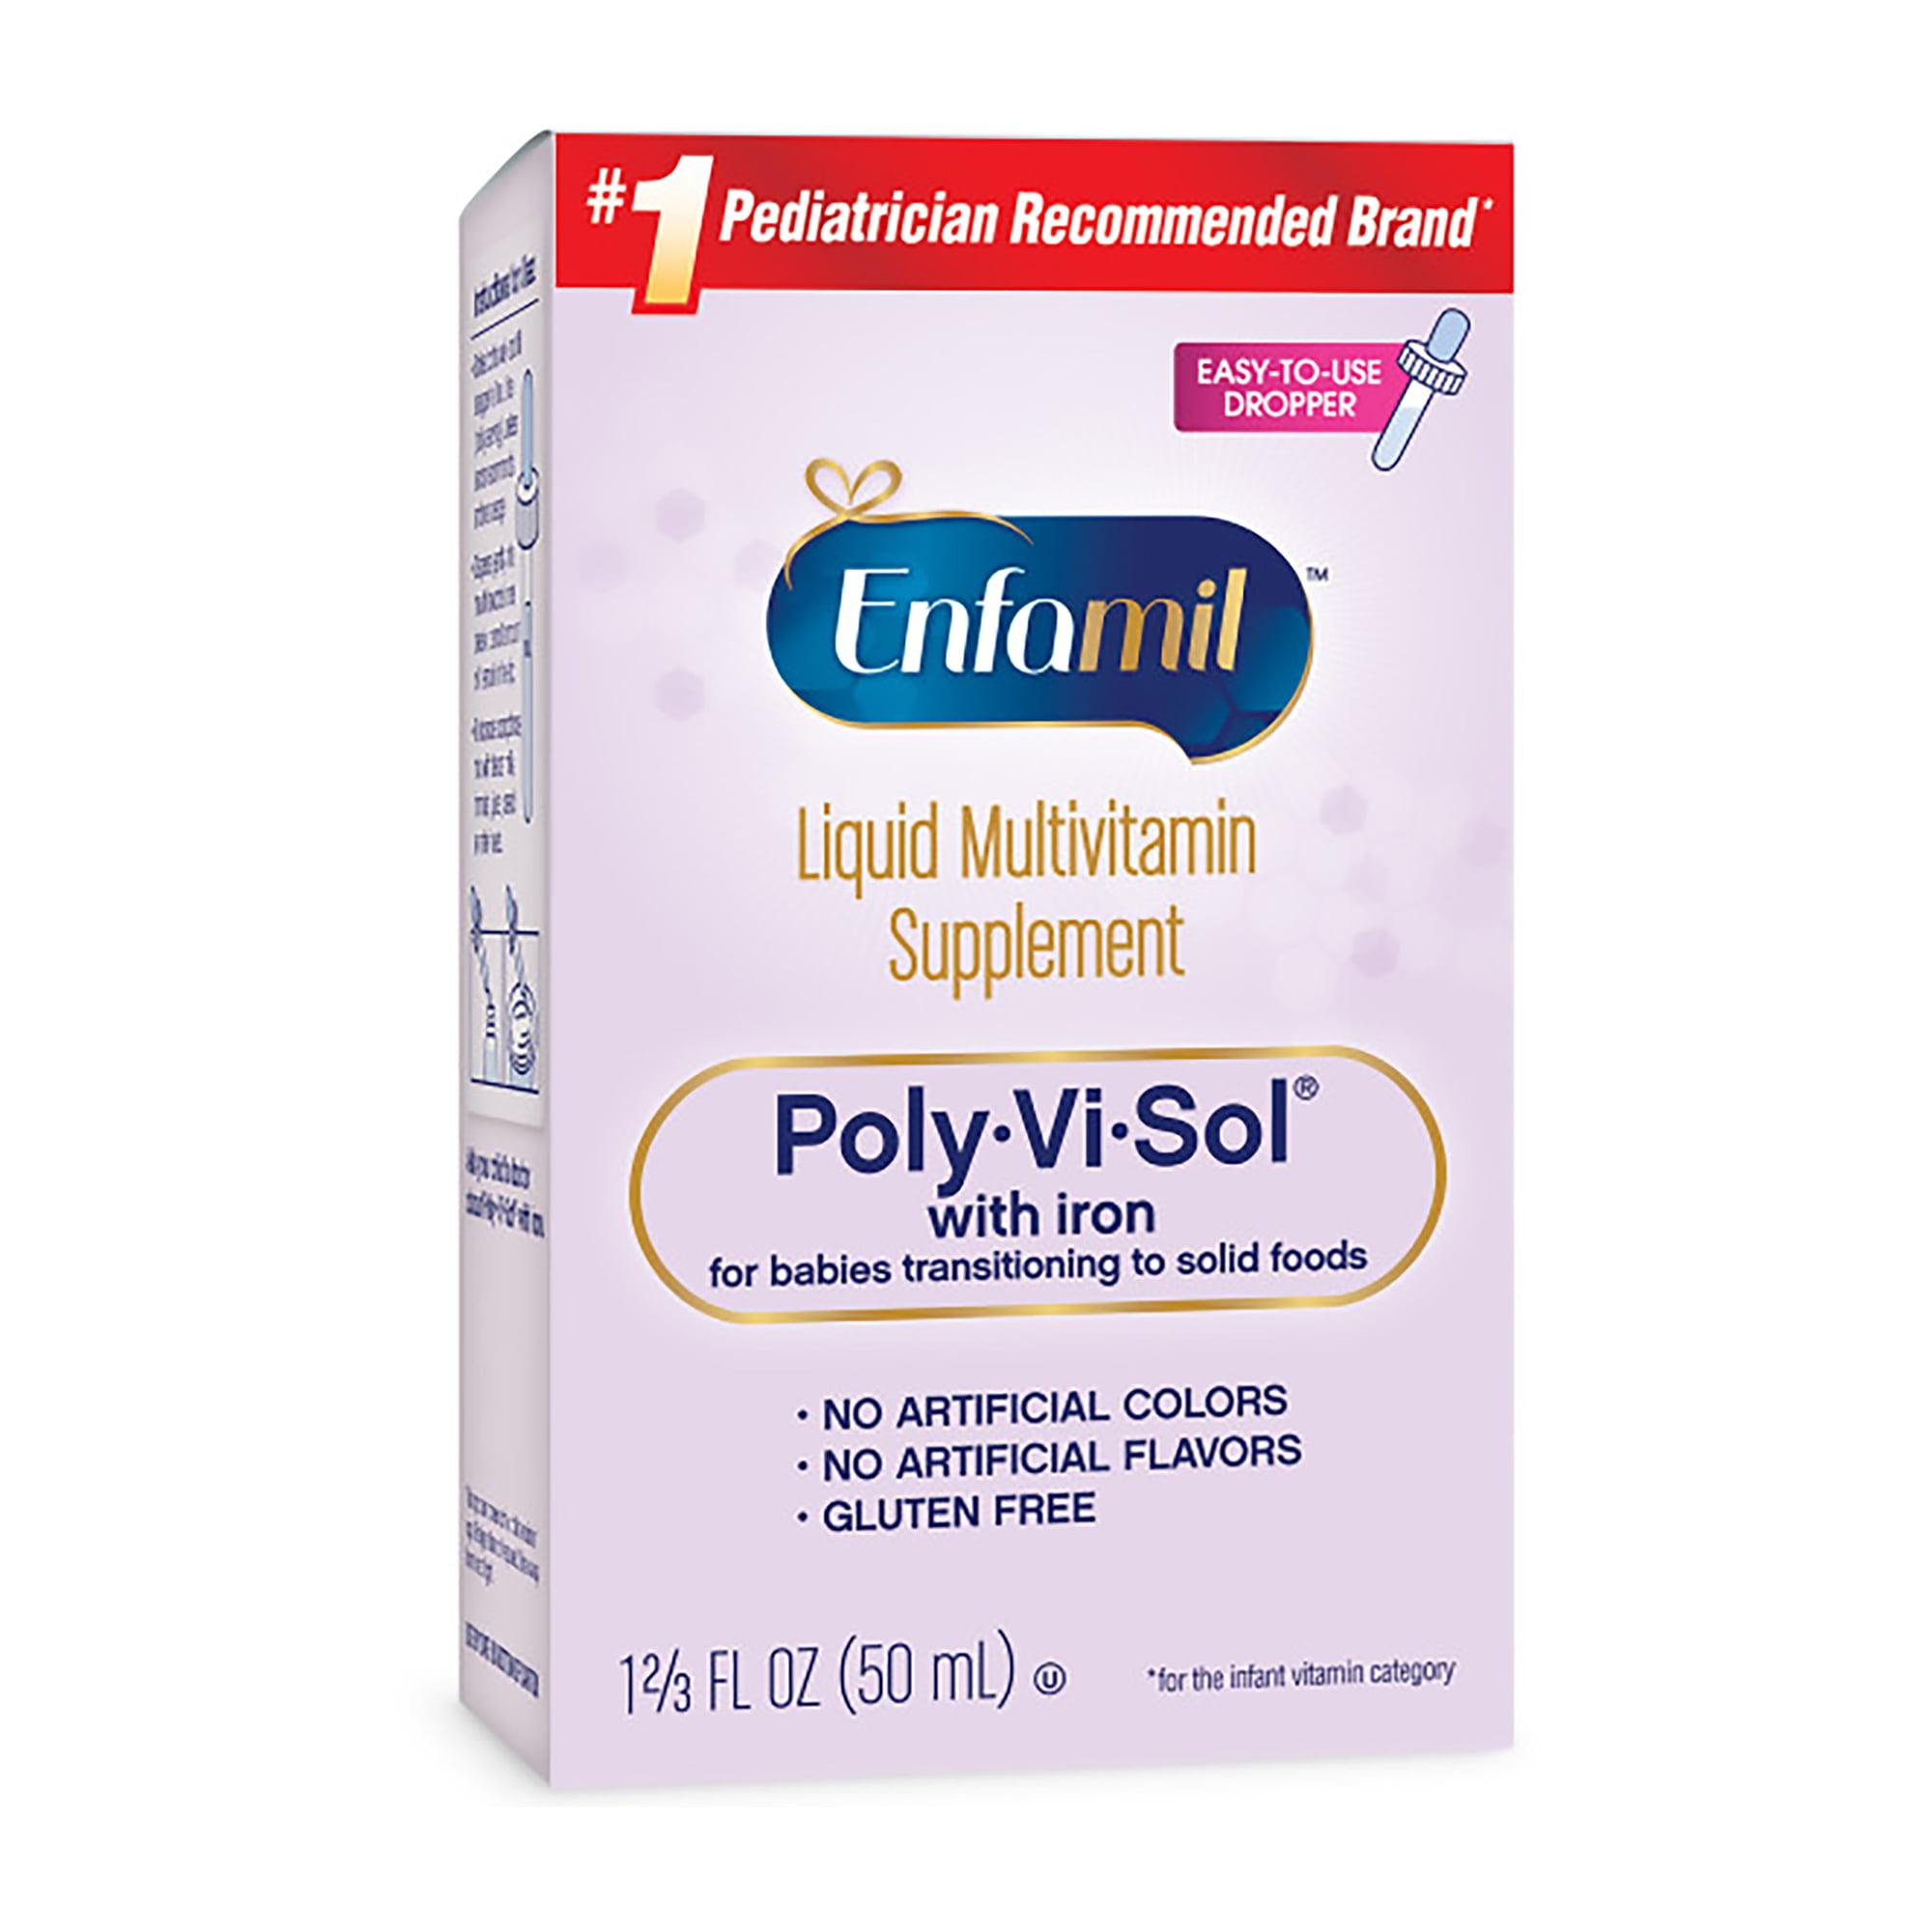 Enfamil Poly-Vi-Sol with Iron, Liquid Multivitamin Infant Supplement, 1.67 fl oz (50 mL)